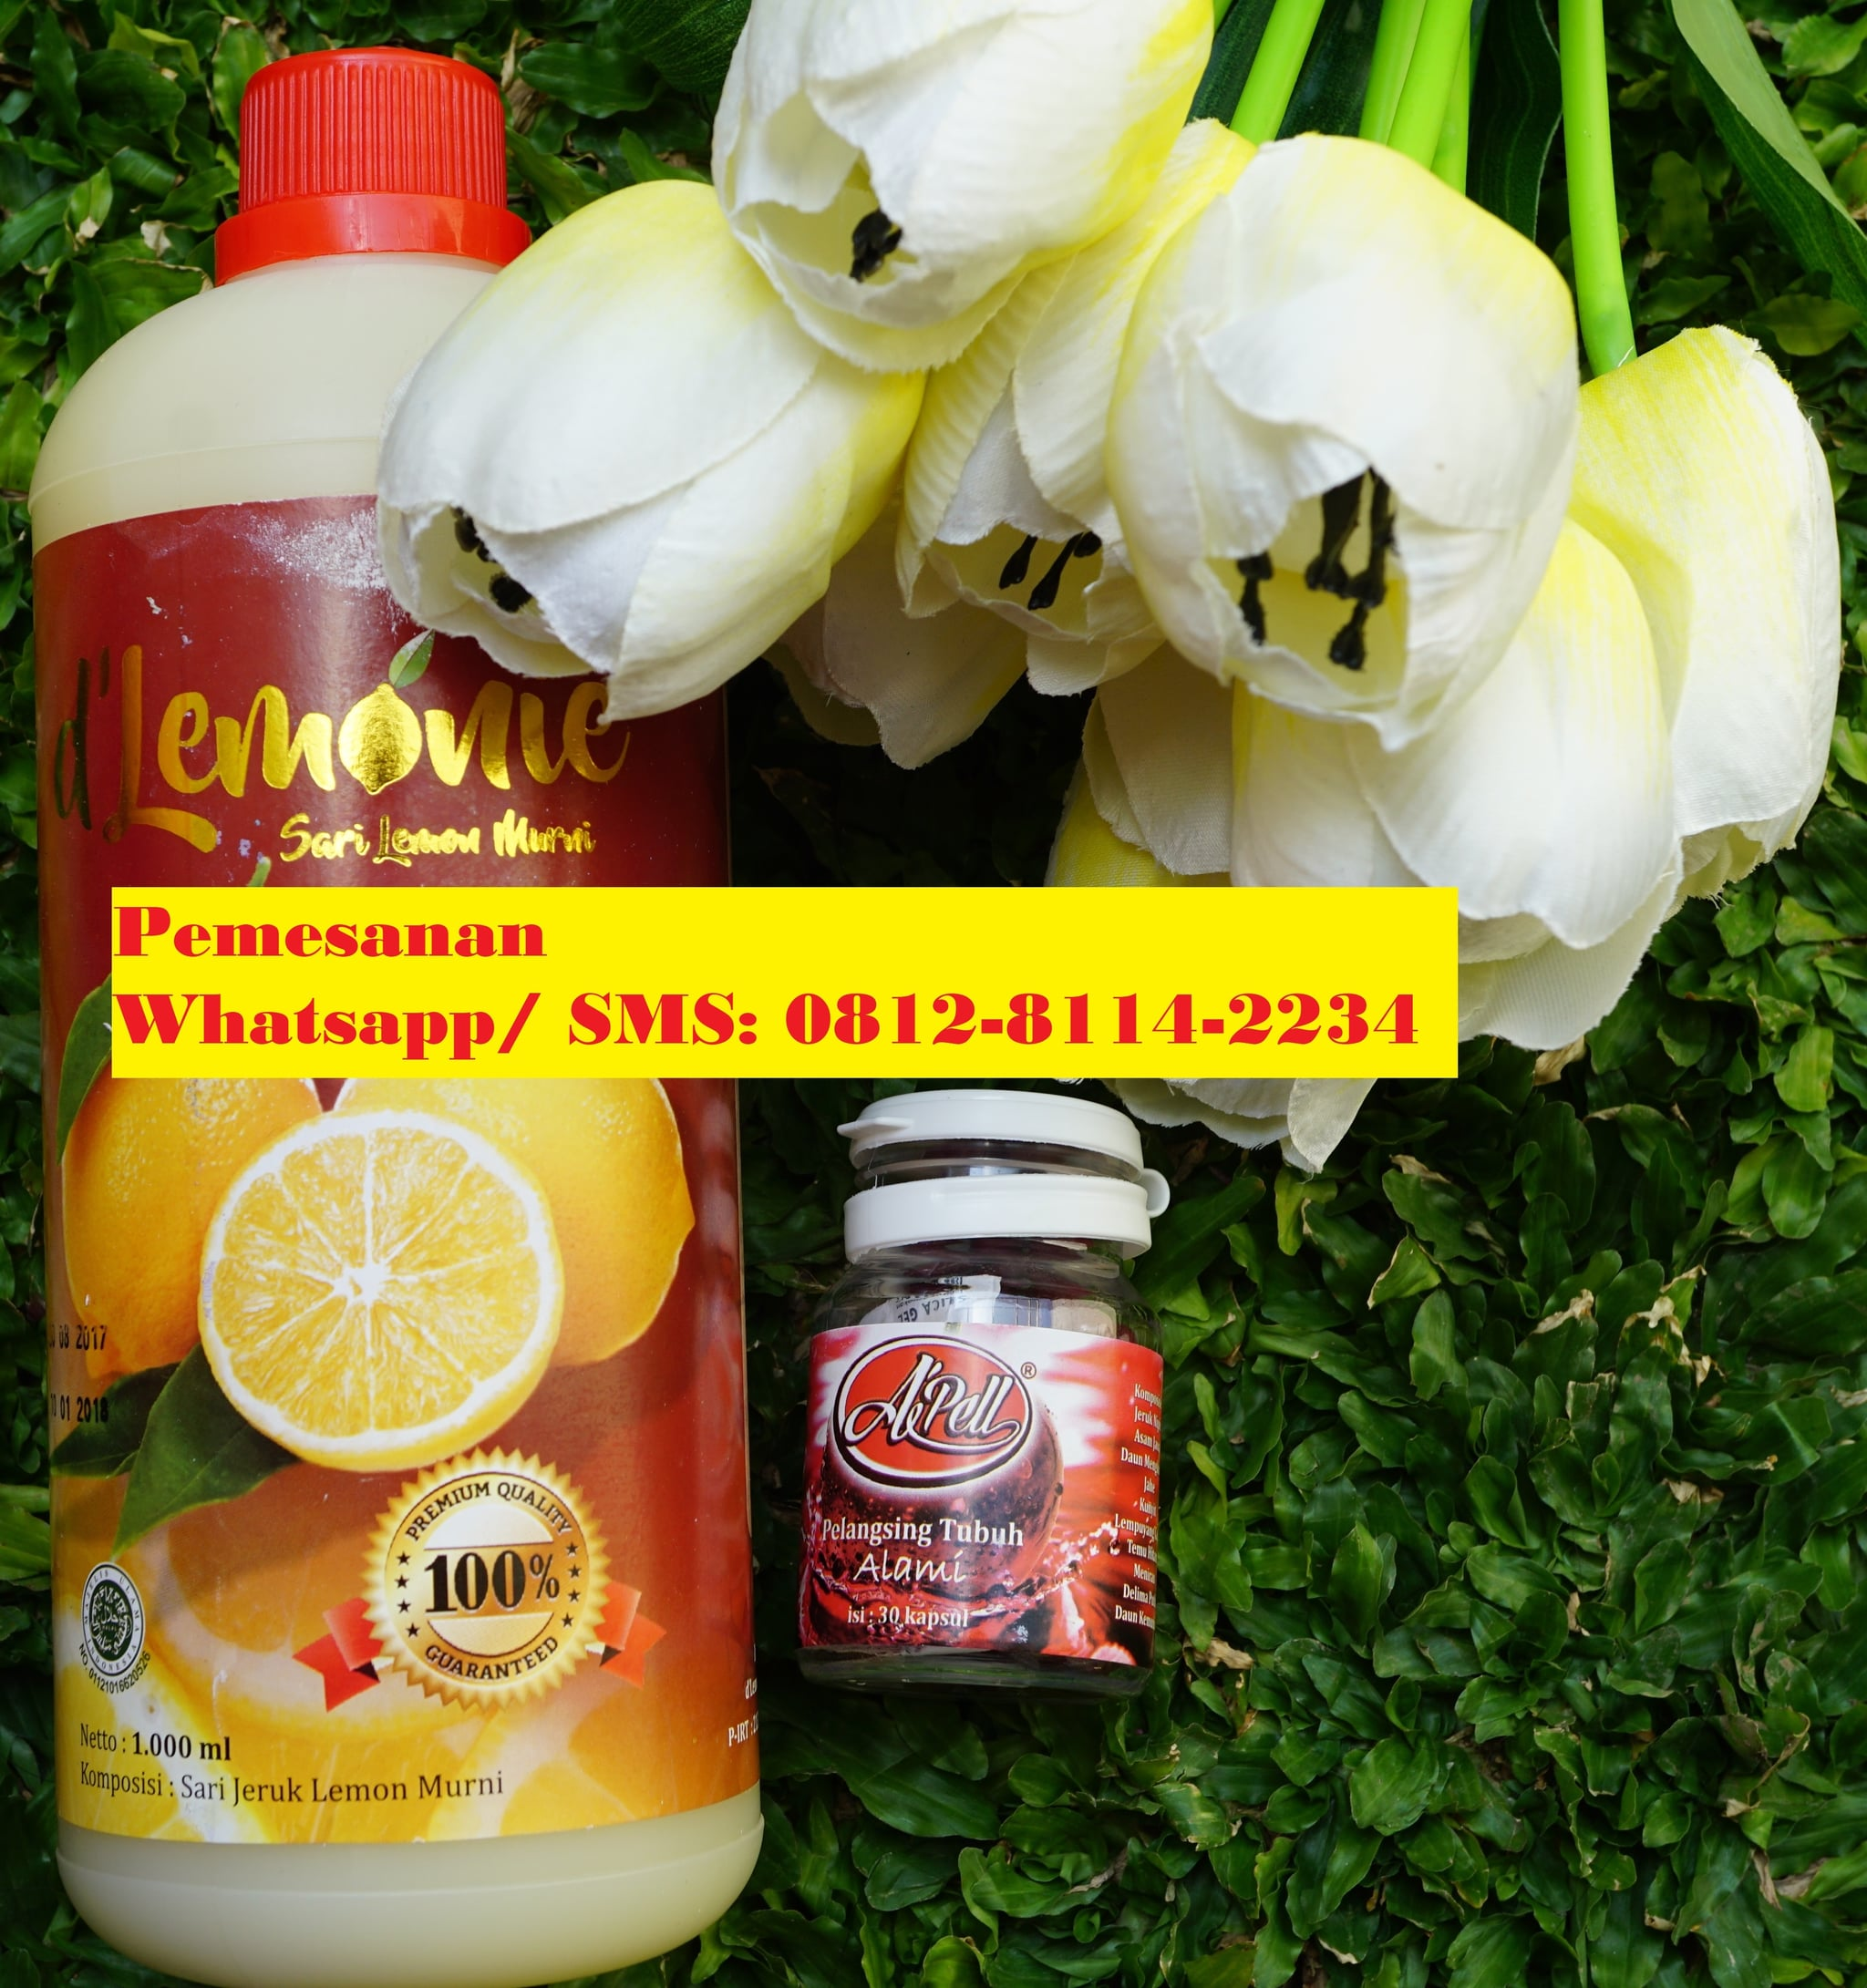 Jual Paket De Lemonie Apel Kapsul Pelangsing Hemat Hot  Kunyit Asem 1 Ltr Delemonie Tokopedia